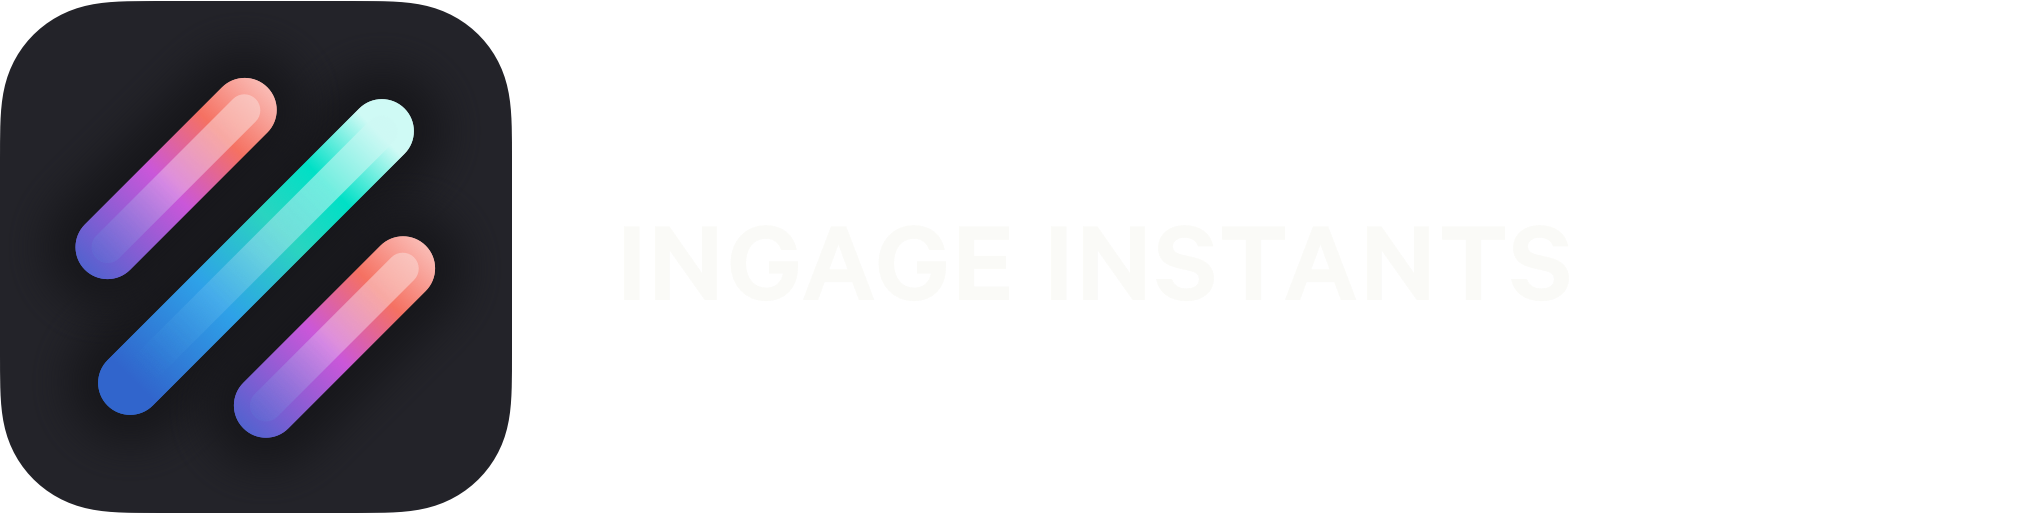 Instants_Logo.png